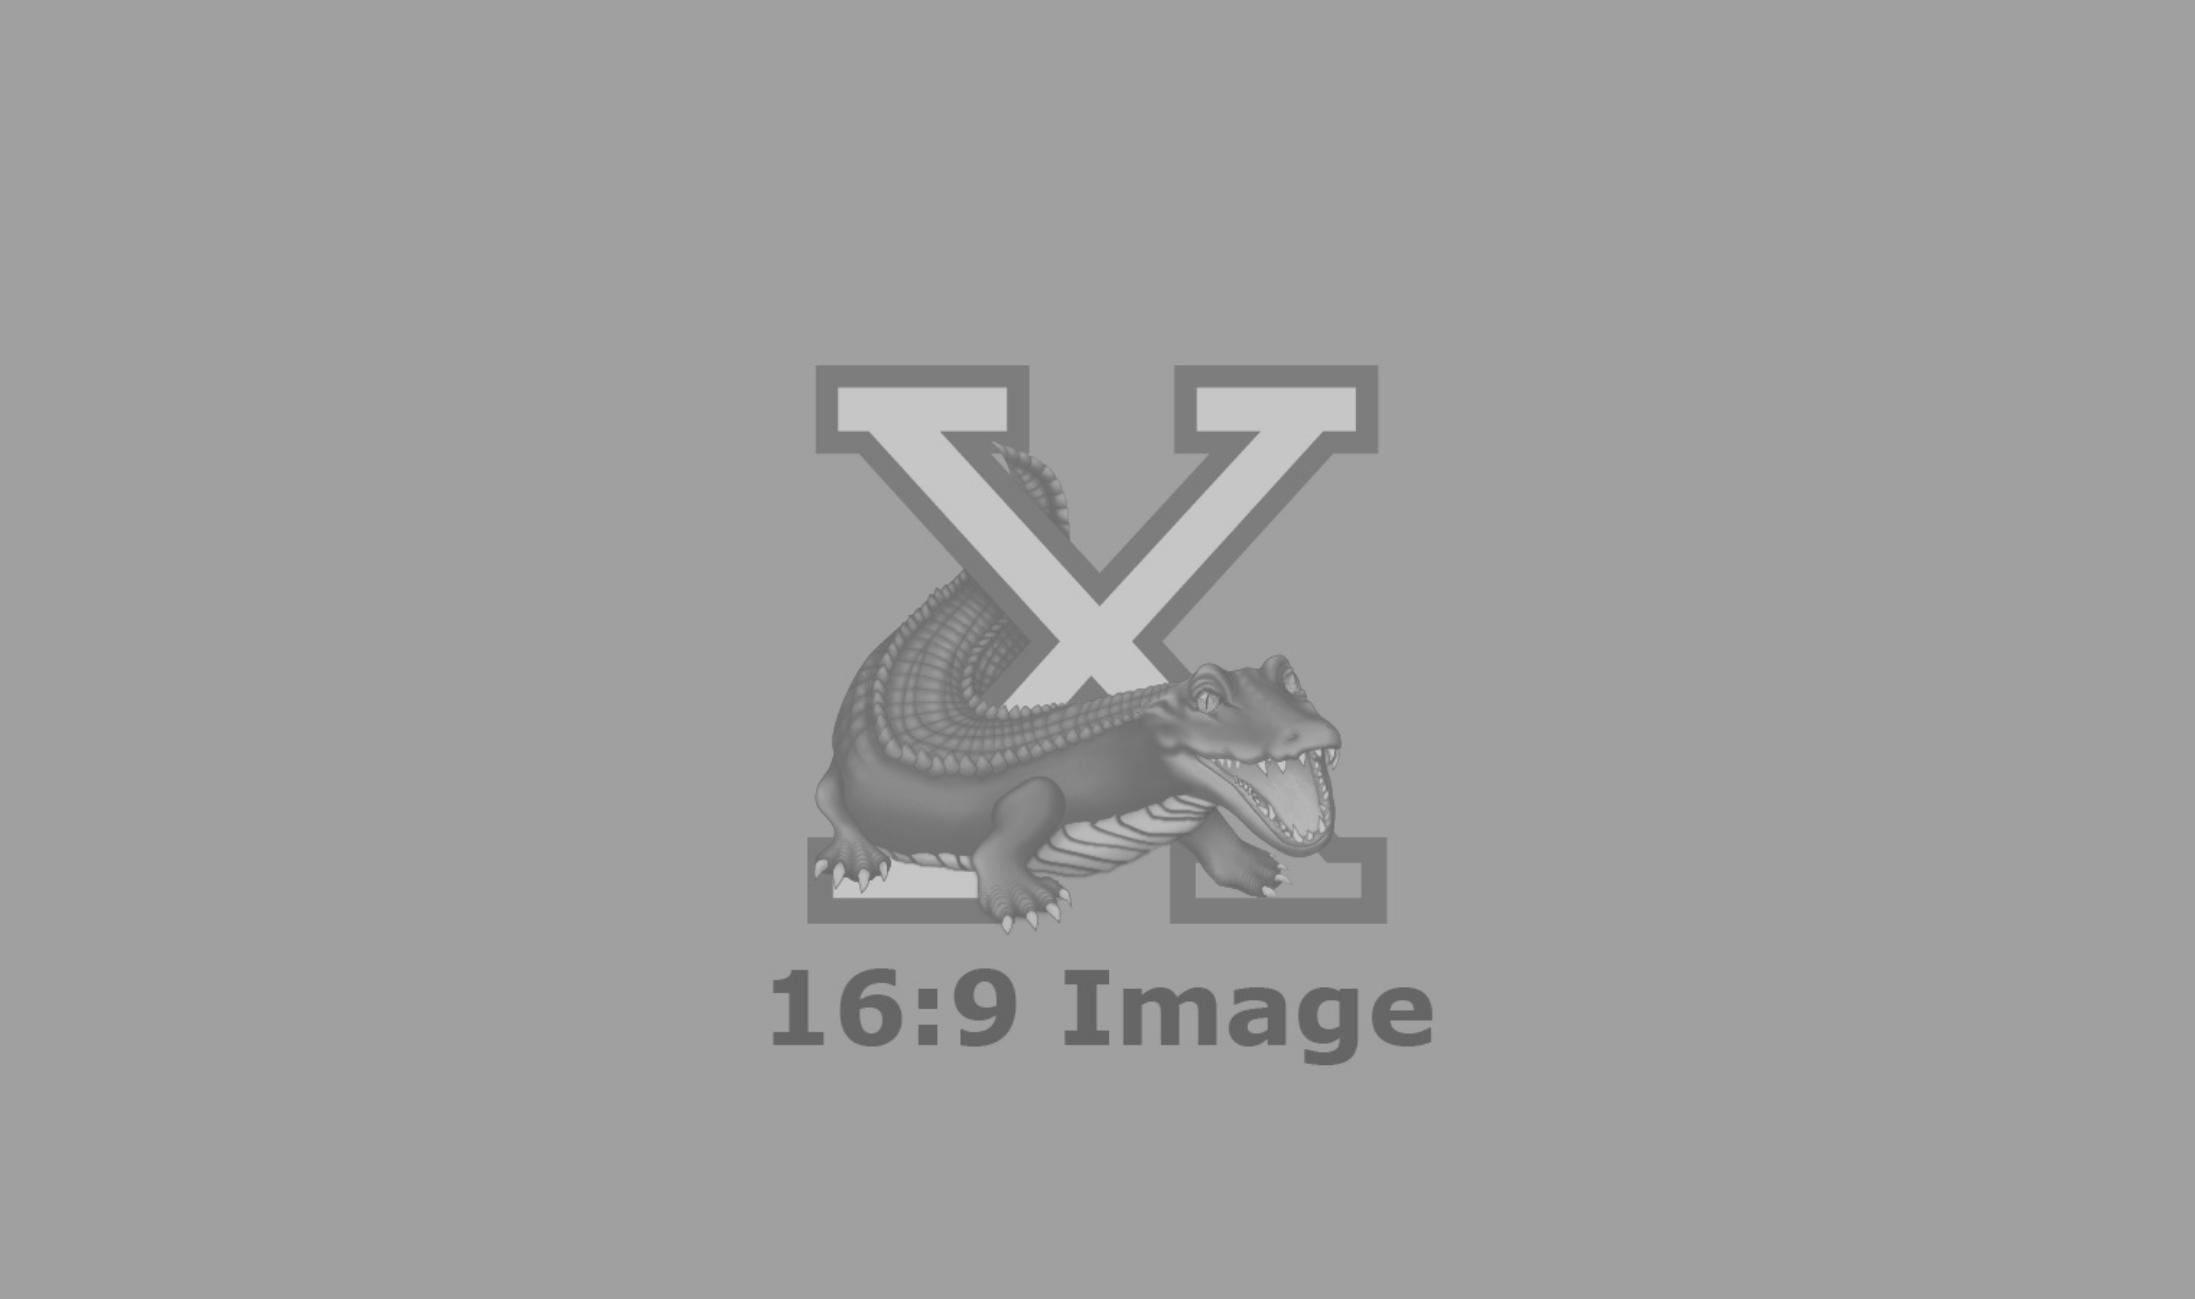 placeholder_image_16-9-ratio@2x